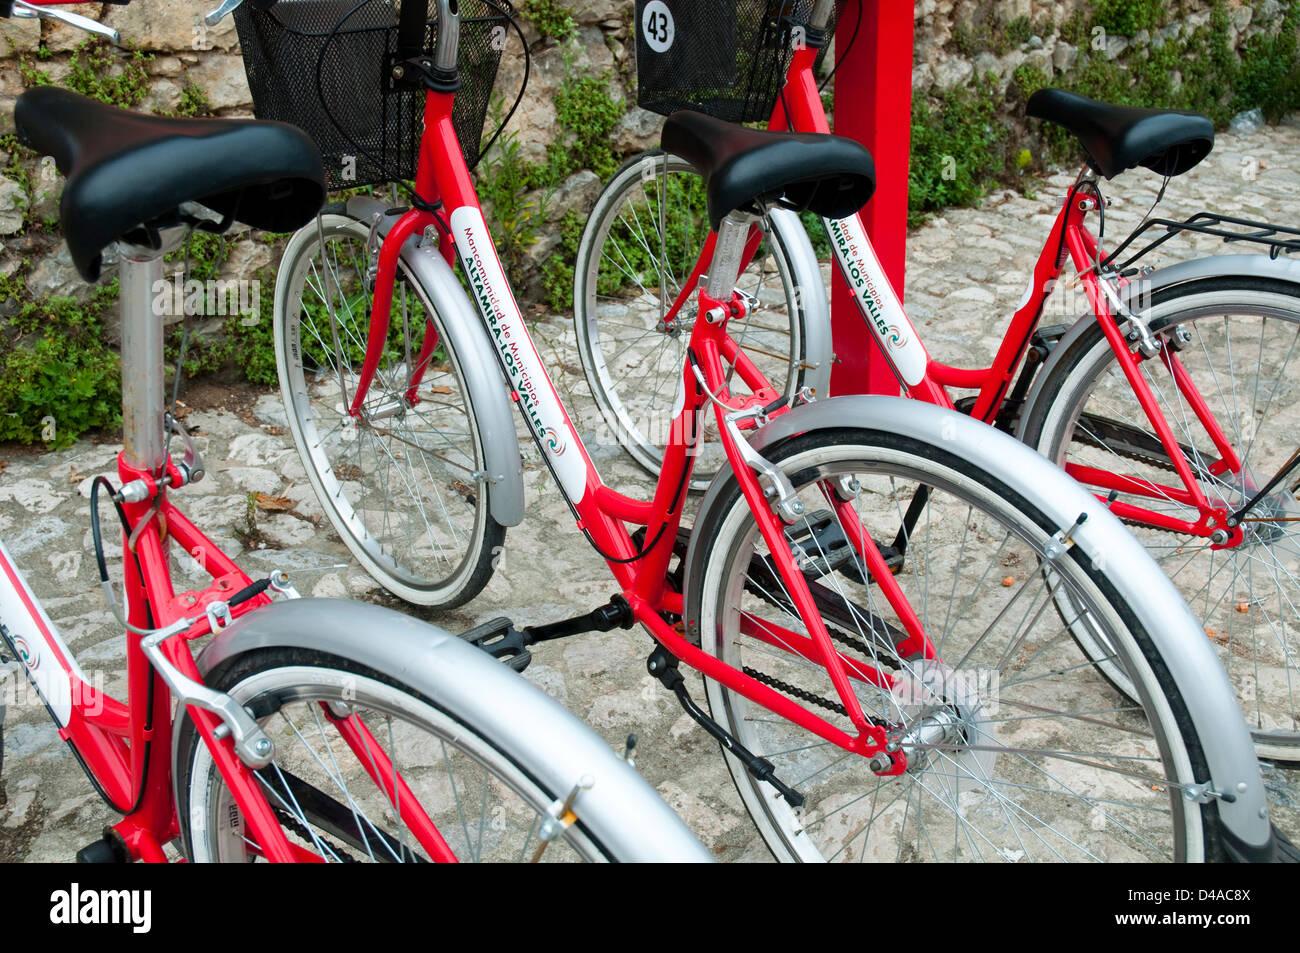 Bikes hire. Santillana del Mar, Cantabria, Spain. - Stock Image